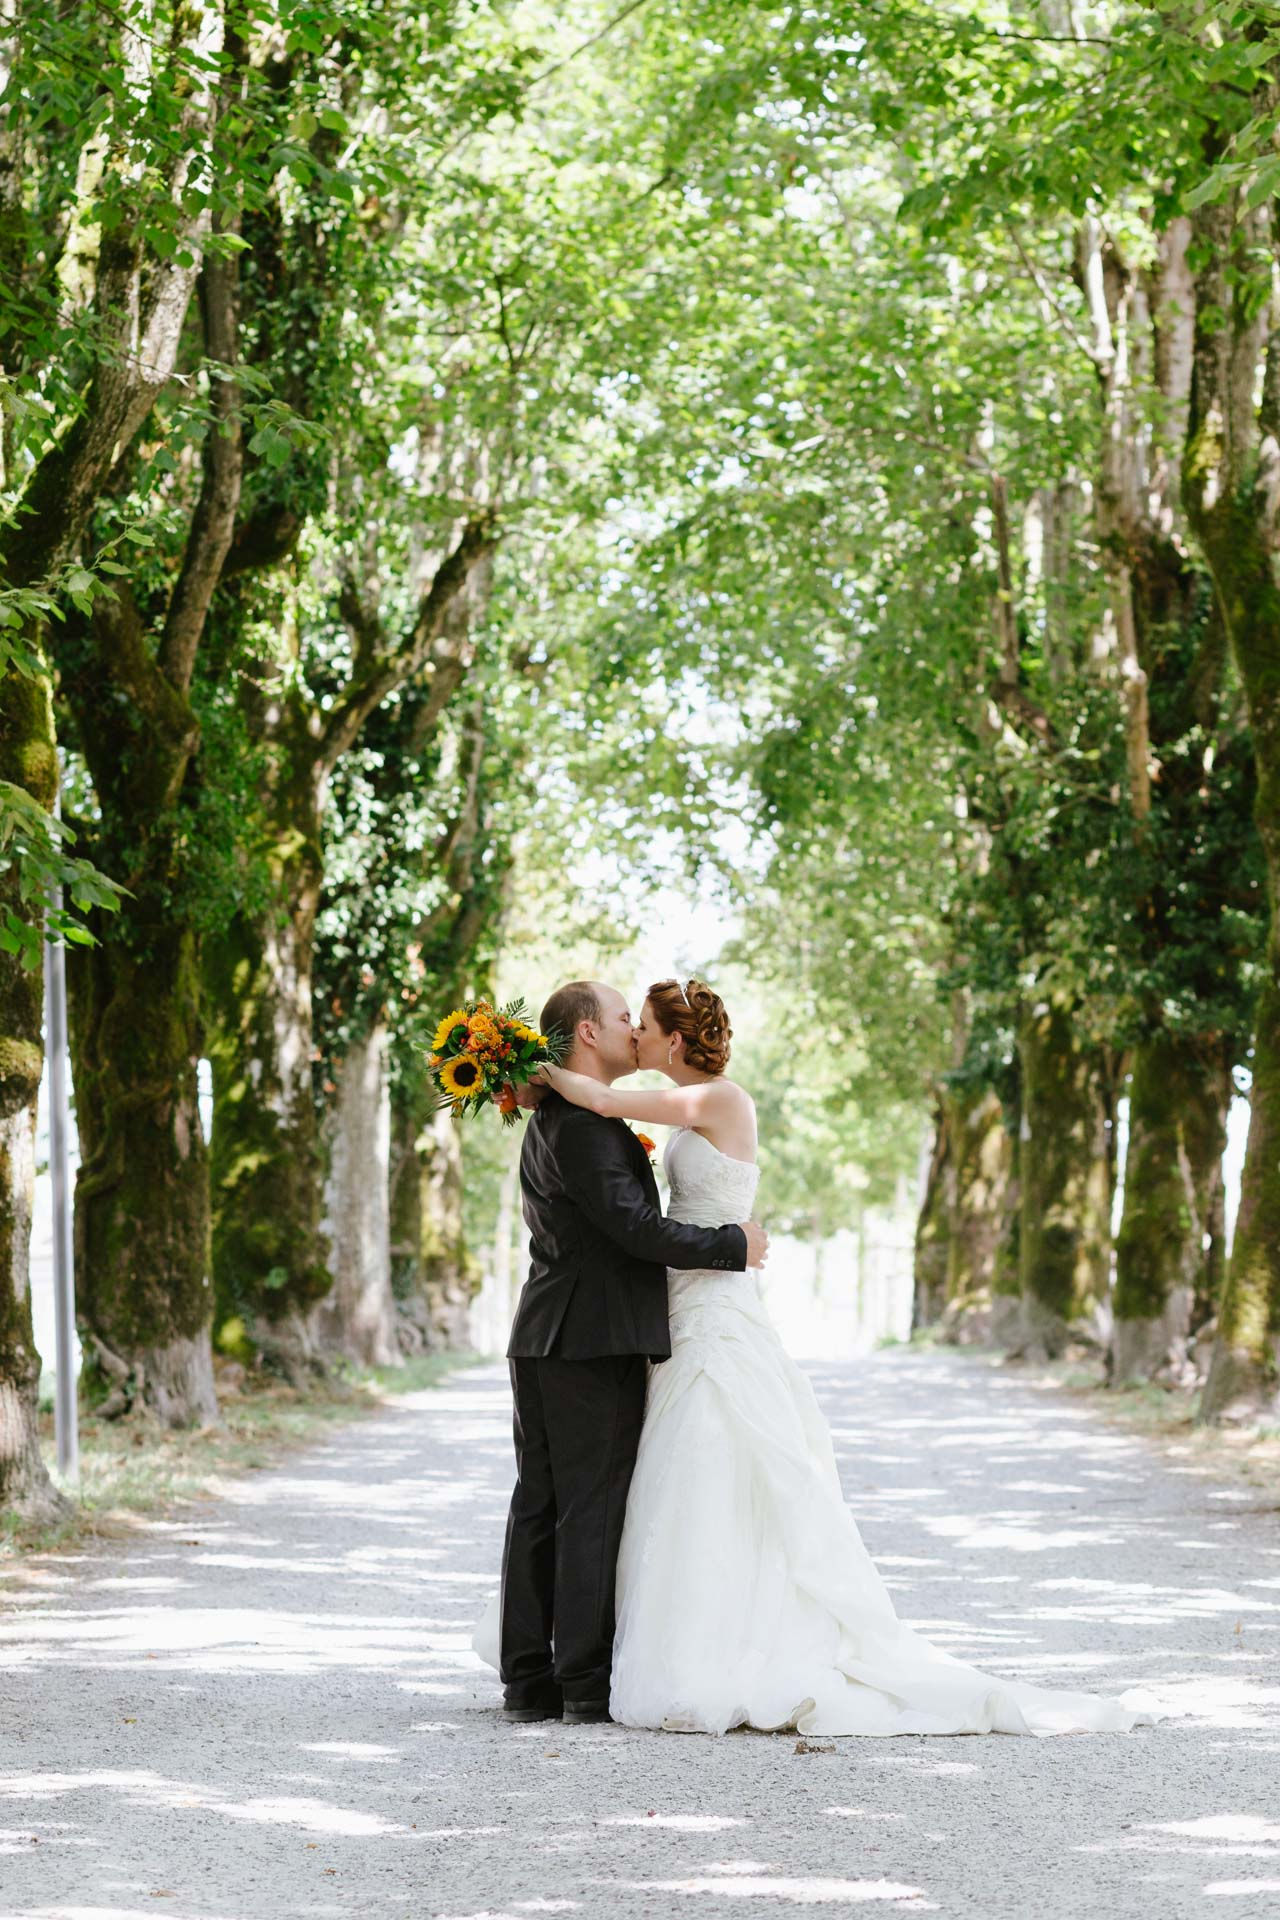 Pixelart_Hochzeitsfotografen_Loerrach_Rheinfelden_Hallwil_Schweiz_Linda-Ramon-1017